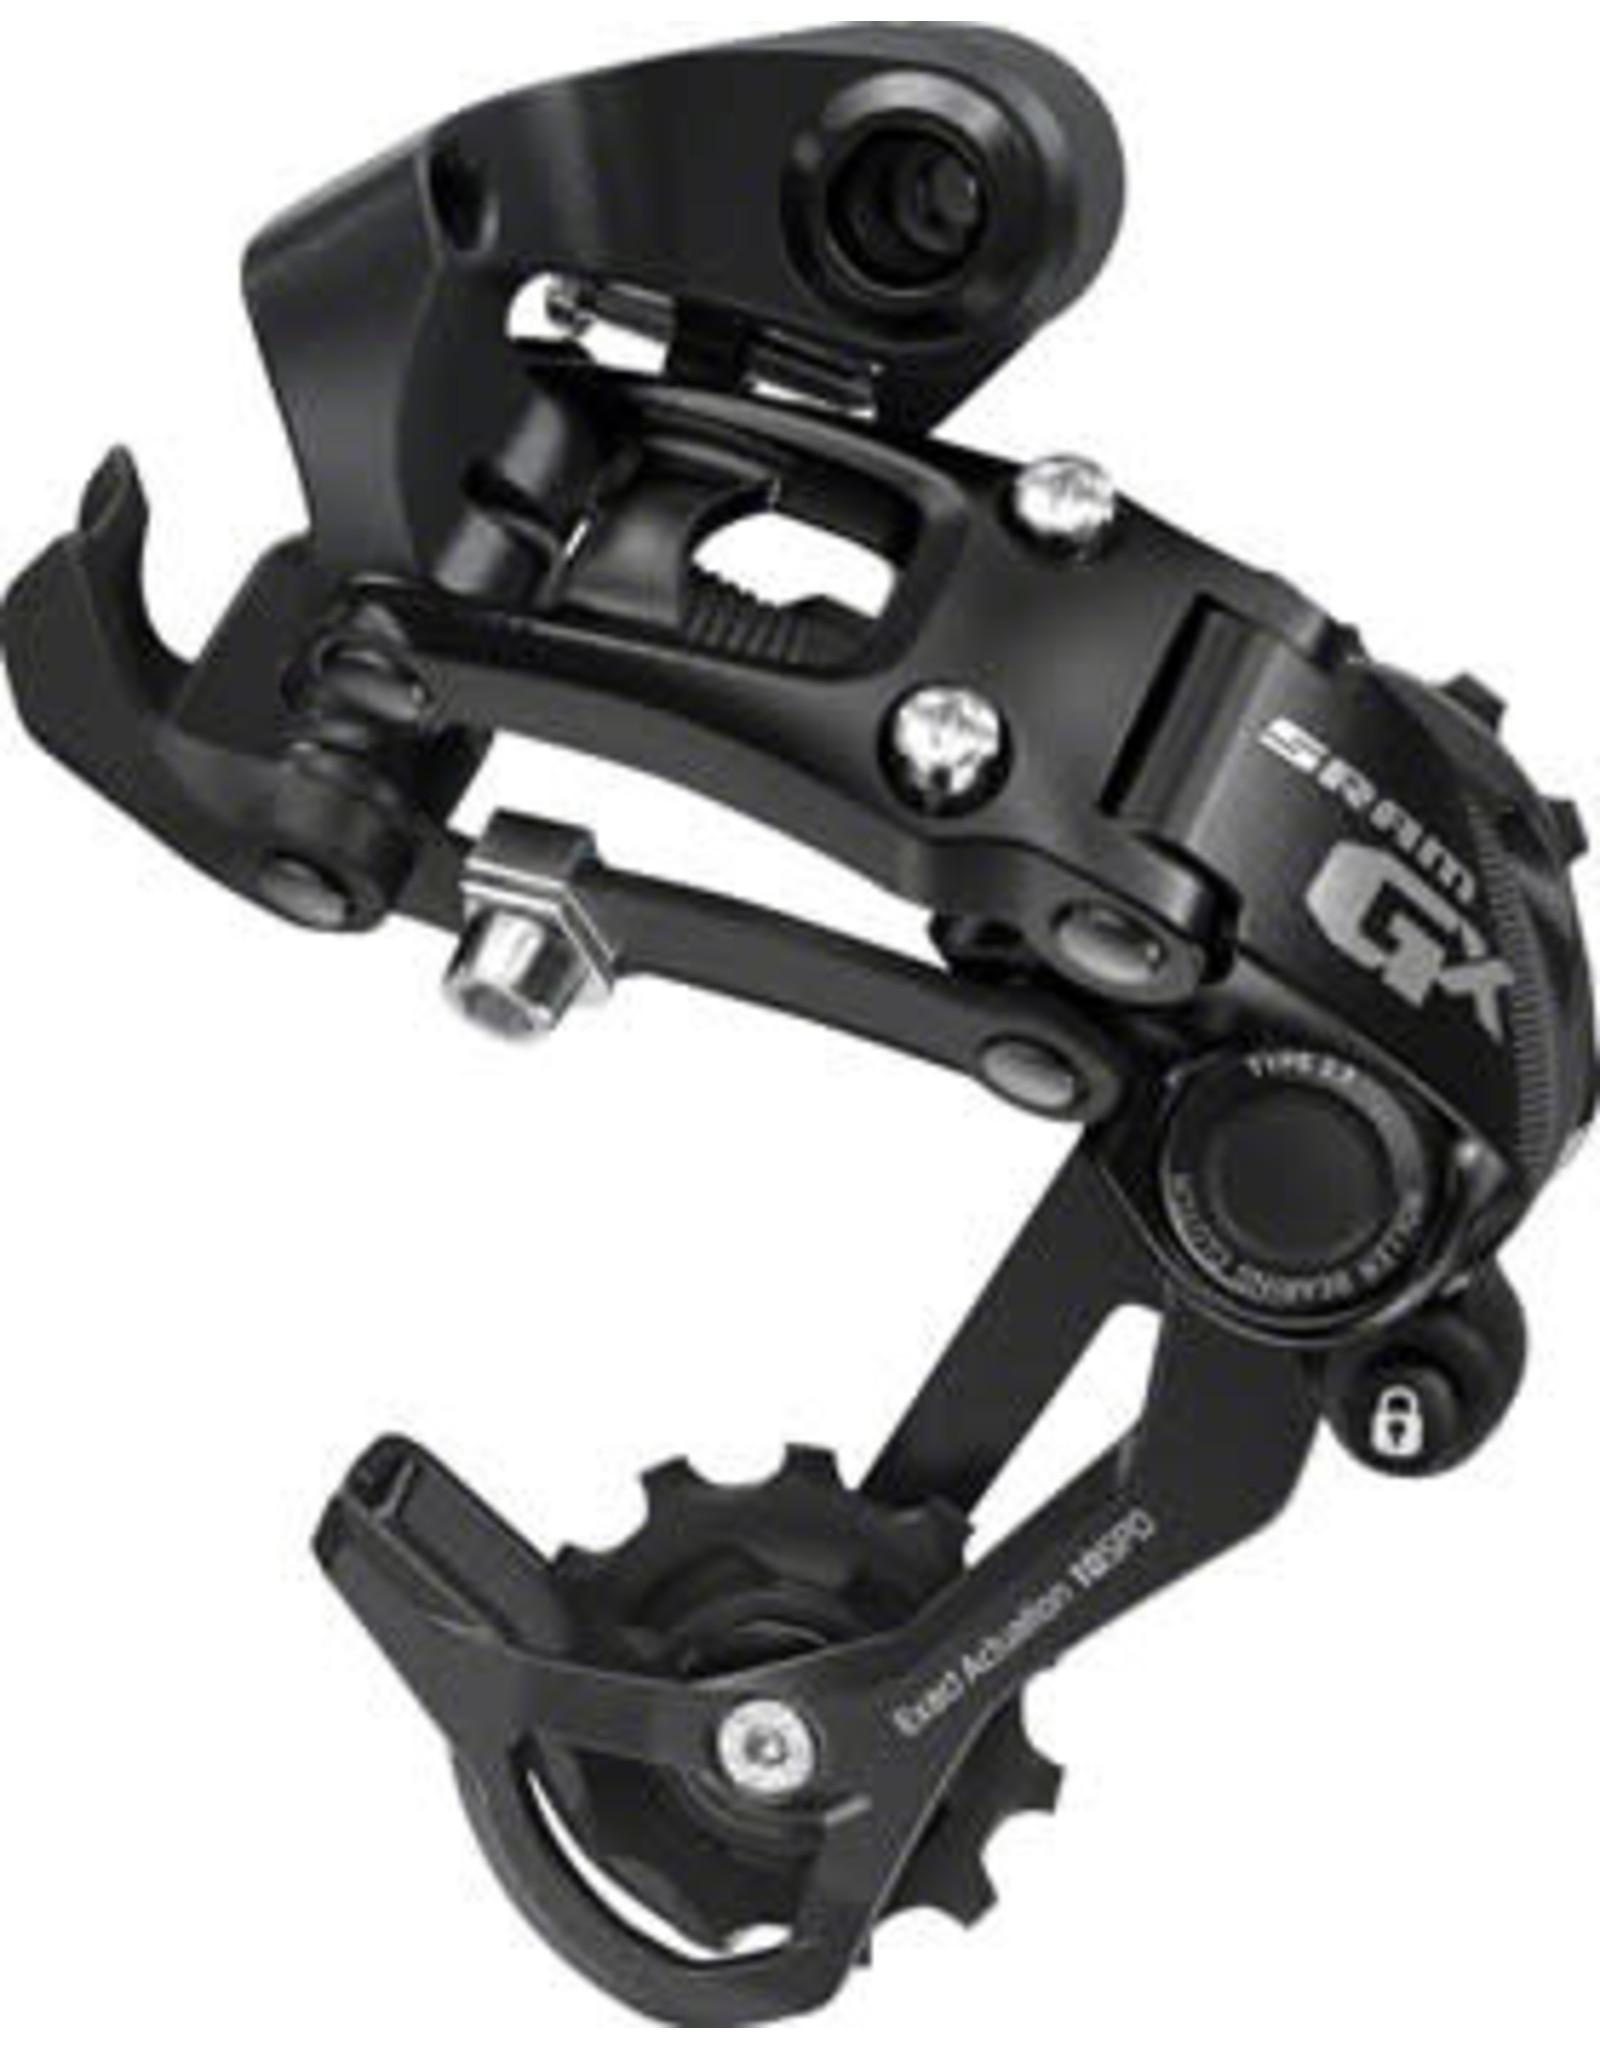 SRAM SRAM GX Rear Derailleur - 10 Speed, Medium Cage, Black